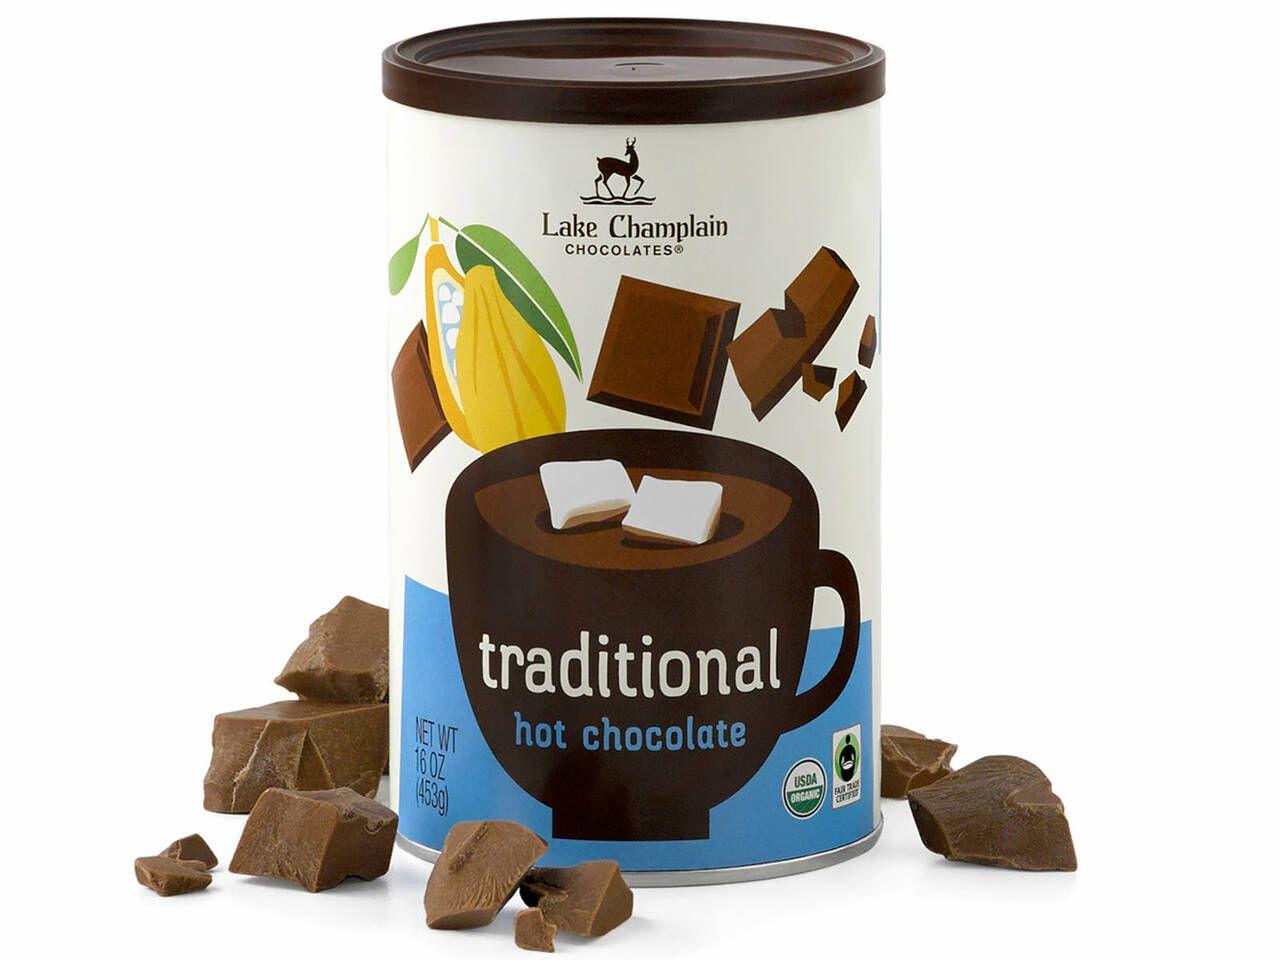 Lake Champlain Chocolates Traditional Organic Hot Chocolate